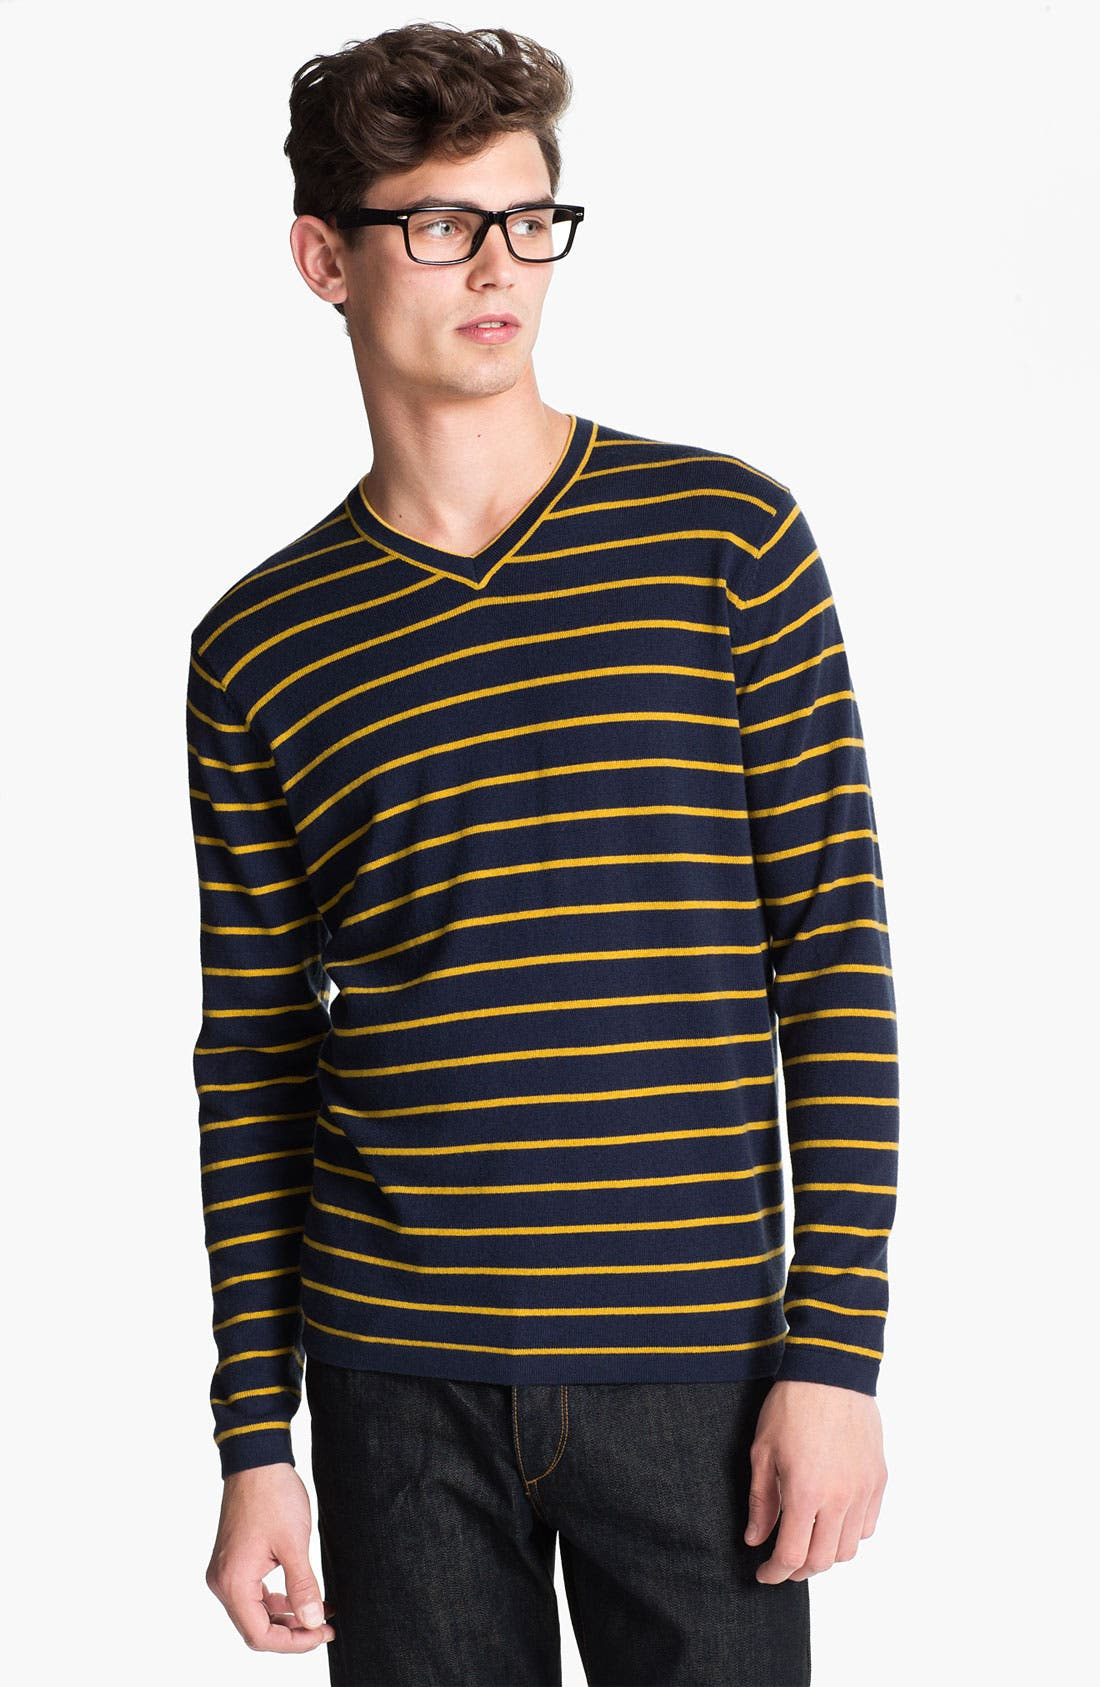 Alternate Image 1 Selected - Cardigan by Lynne Hiriak 'Serge' Merino Wool V-Neck Sweater